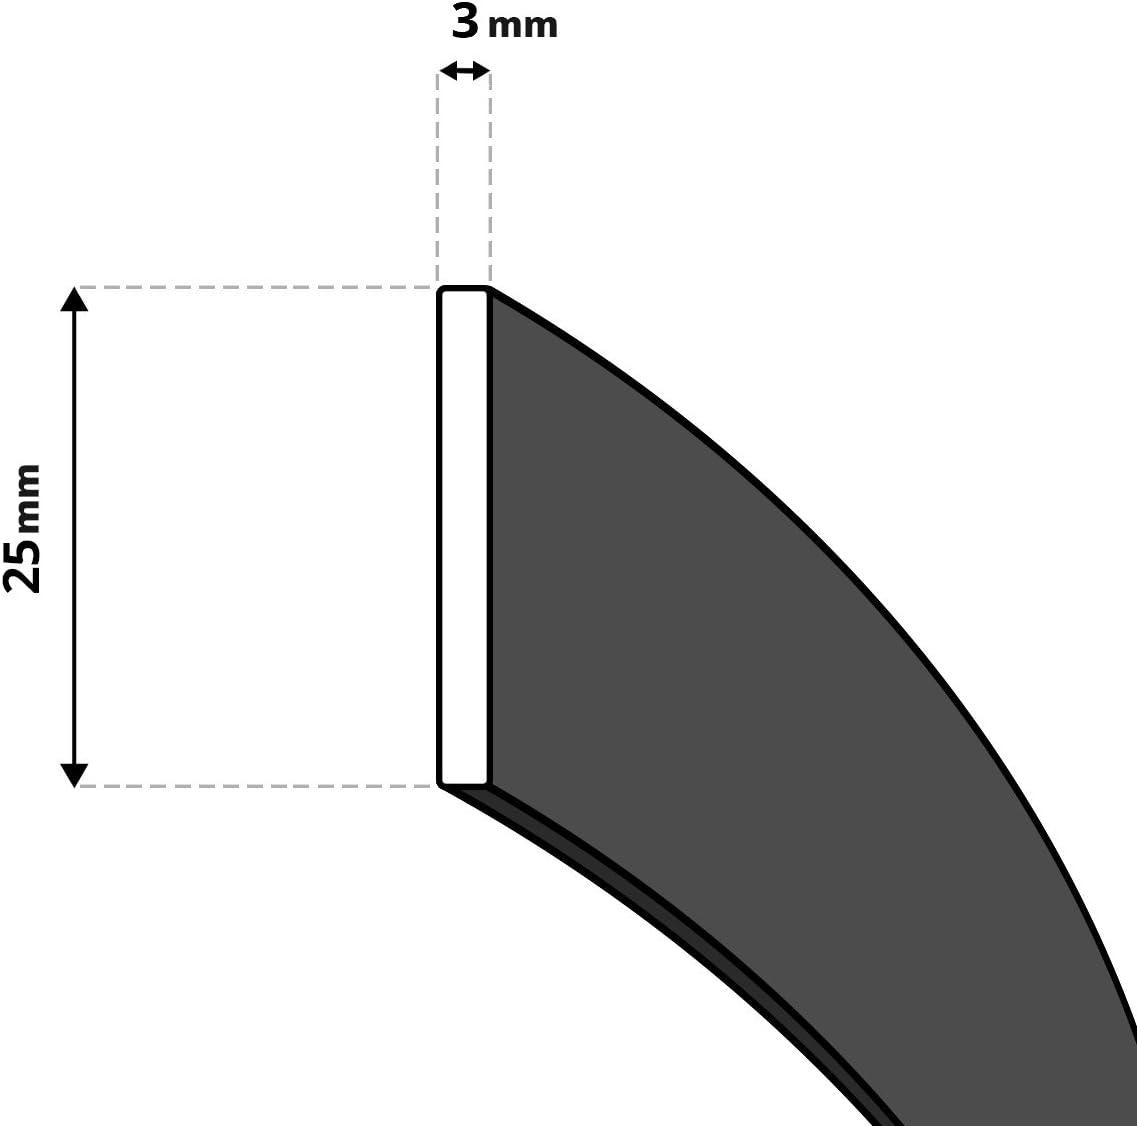 10x2 mm STEIGNER Ruban Auto-Adh/ésif en Fibre de Verre SKD03 1,5 m Scellant Noir R/ésistant /à la Temp/érature Constante jusqu/à 550 /° C